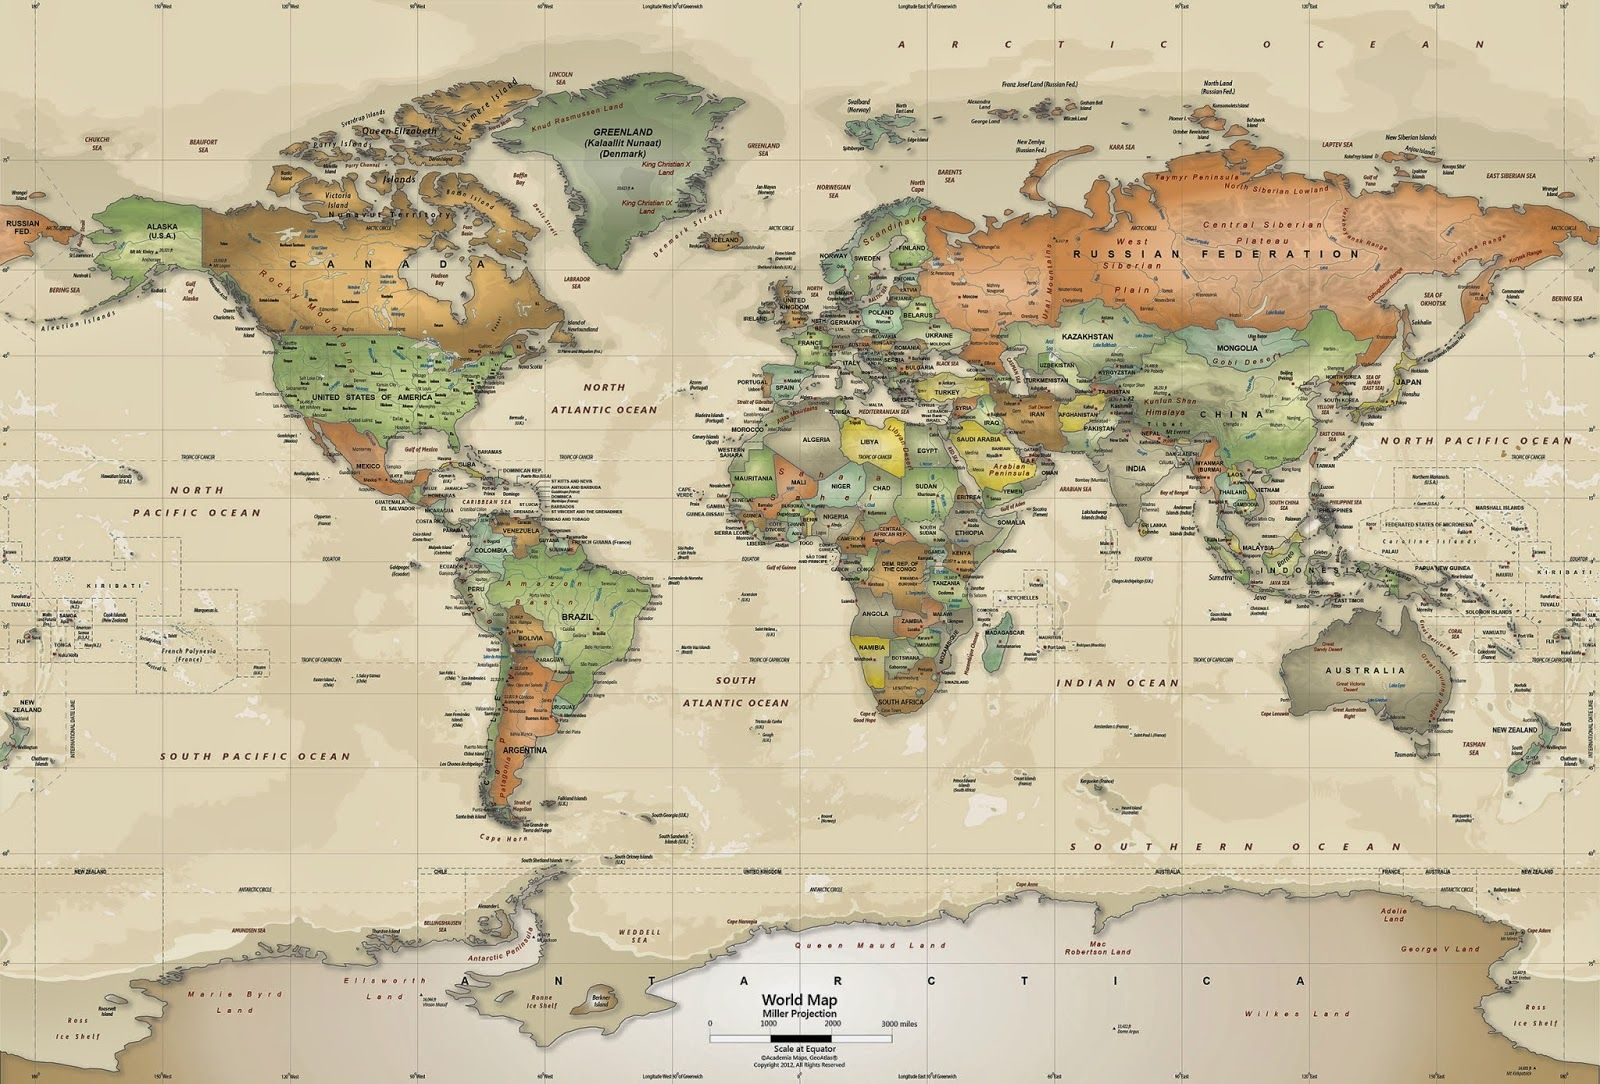 World Map Desktop Wallpaper Sfondi Sfondi Per Computer Geografia Mondo